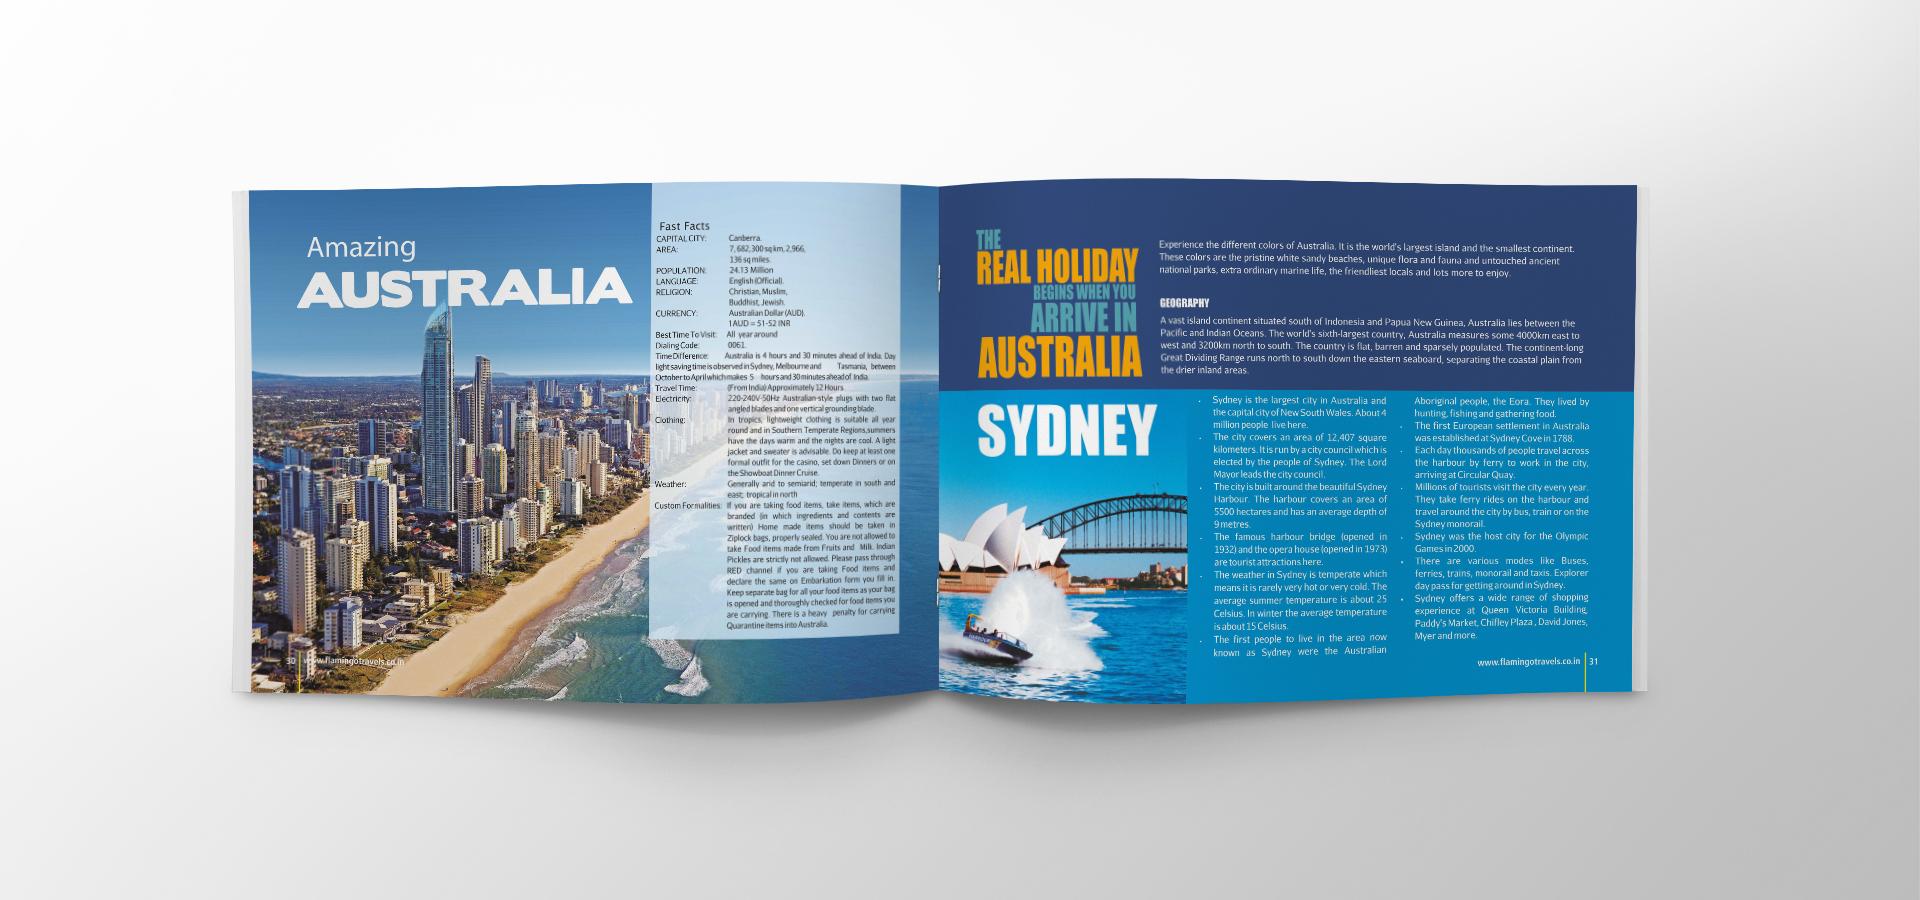 Flamingo Austrila-Newzeland Brochure Inside new